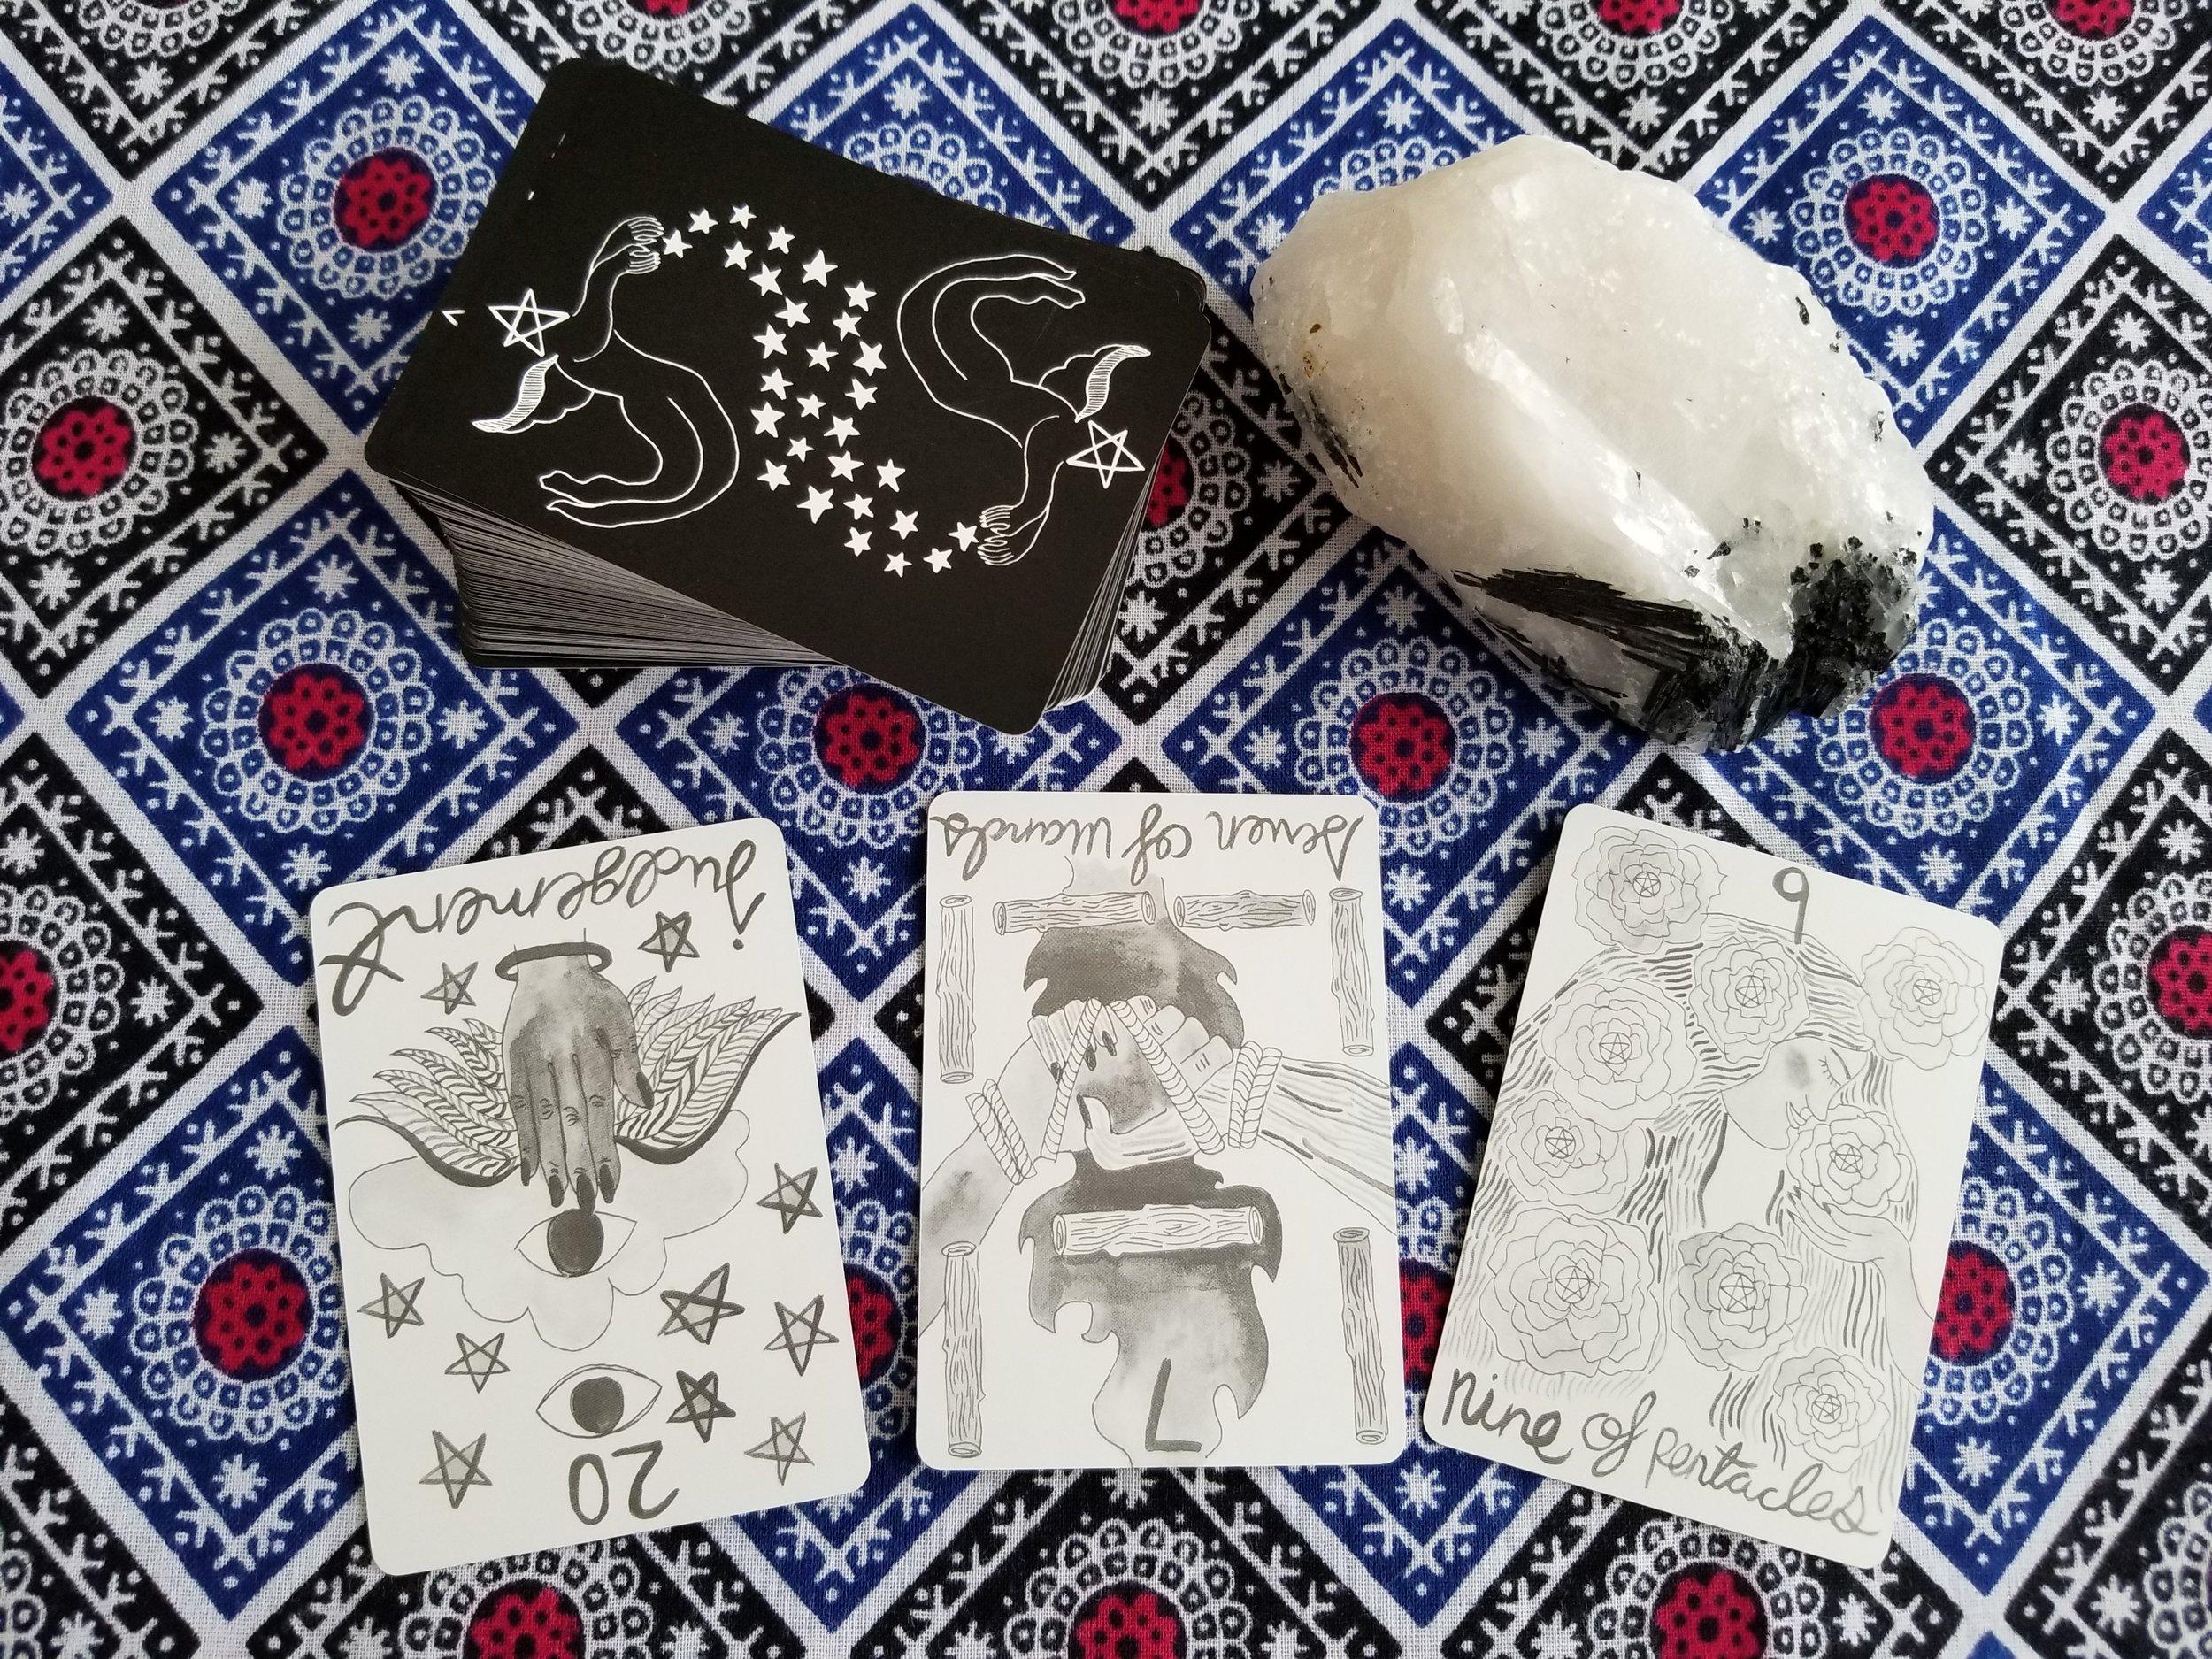 reading from the Divina Tarot